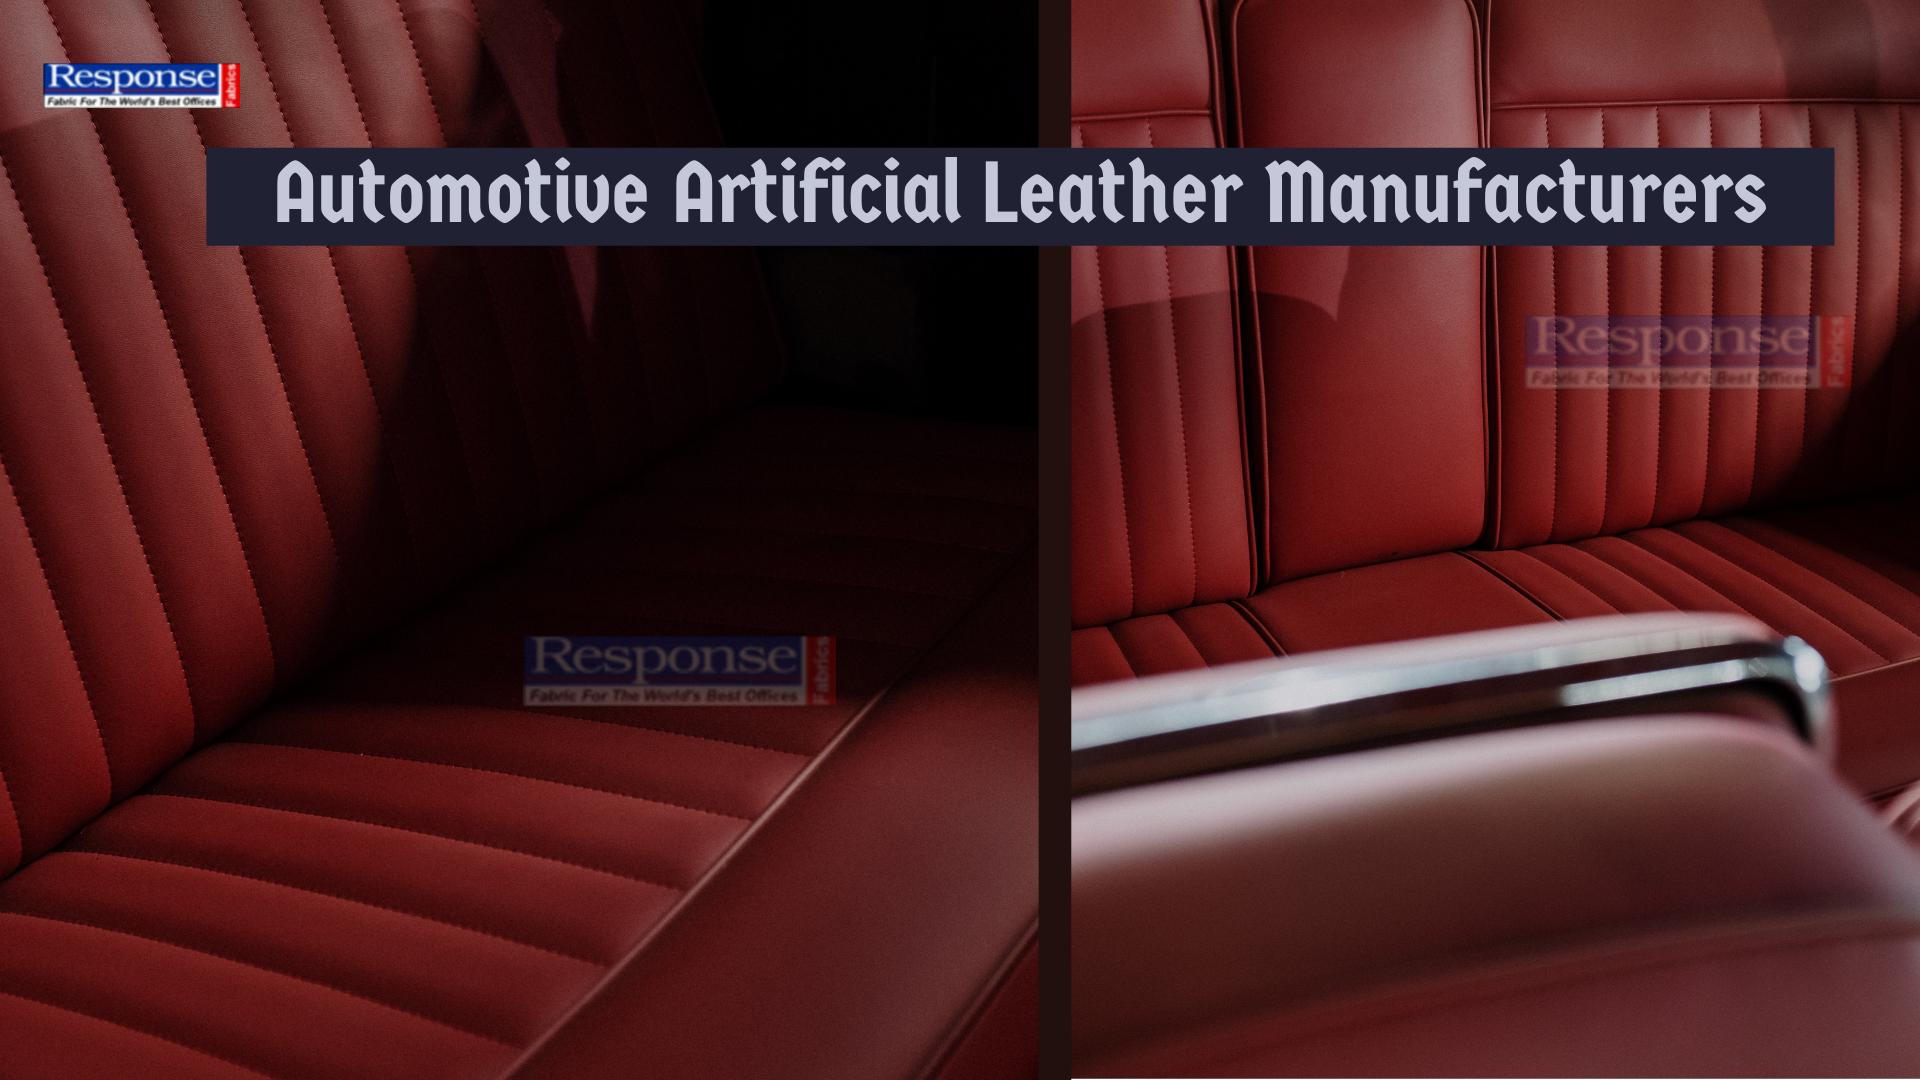 Automotive Artificial Leather Manufacturers